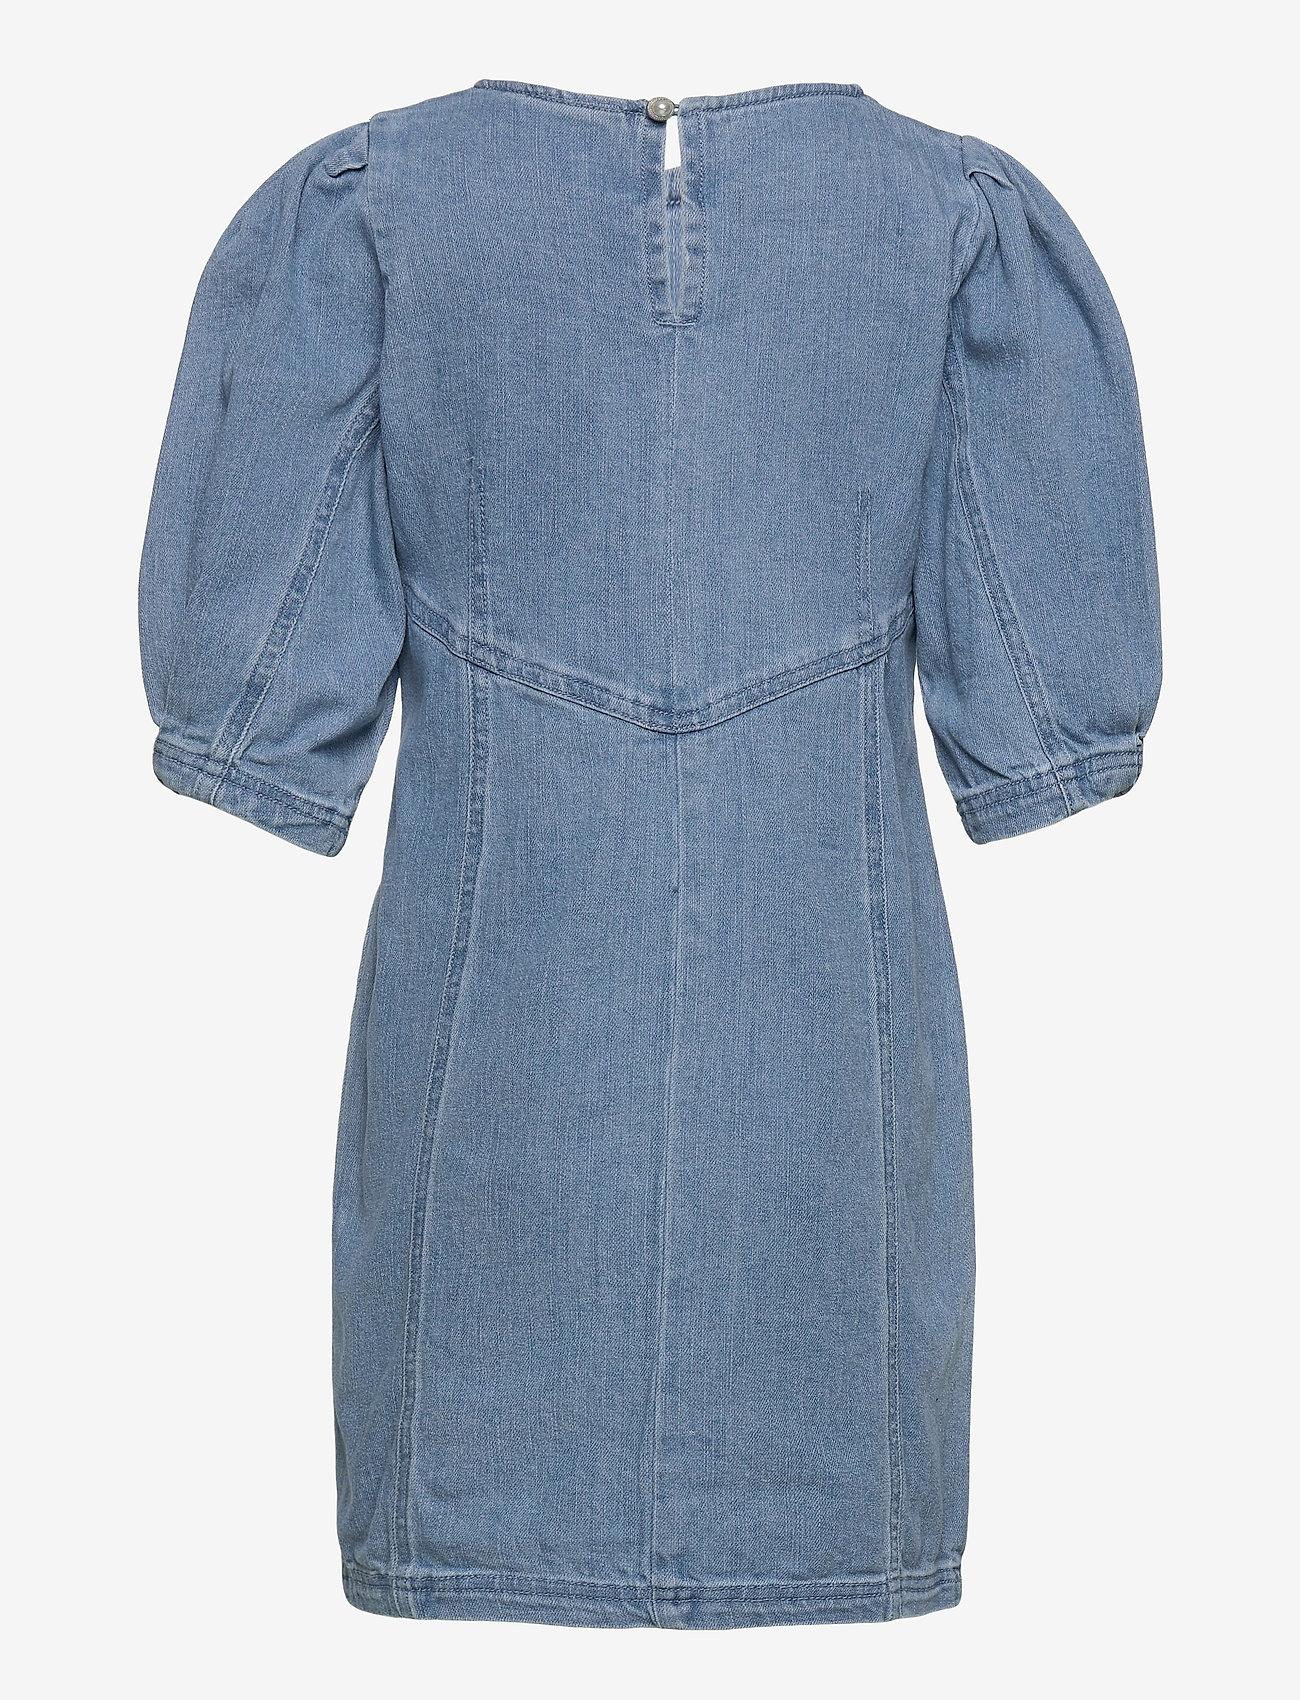 Kids Only - KONALVA LIFE 3/4 PUFF DRESS DNM - kleider - medium blue denim - 1